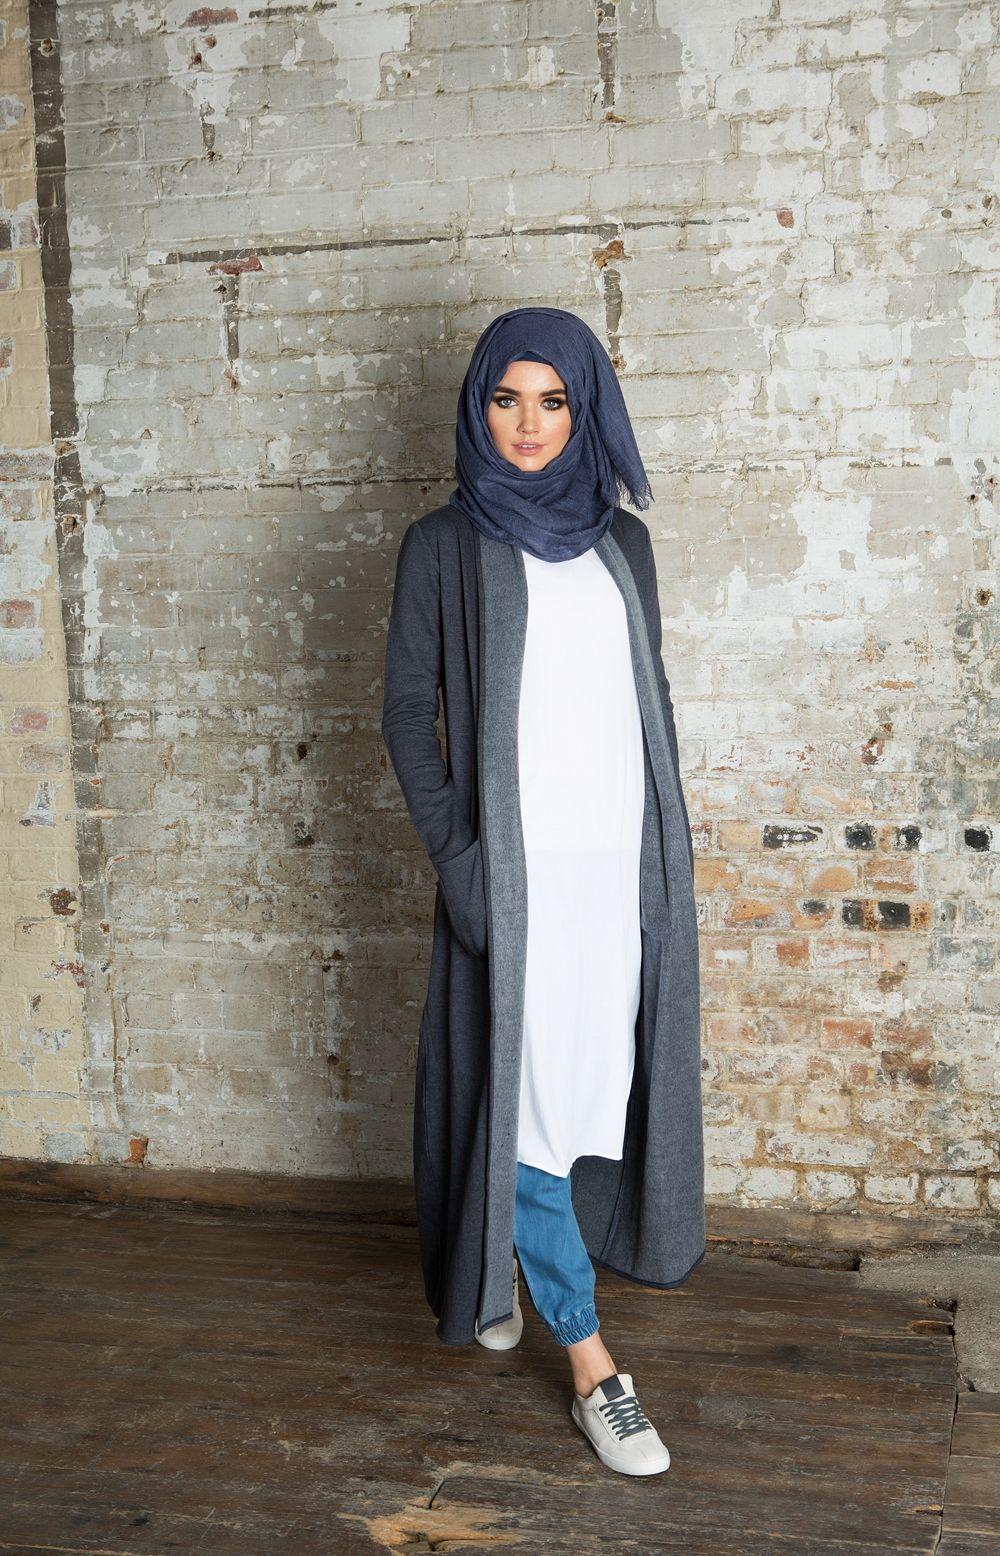 Coatigan | Aab | Hijab fashion, Hijab outfit, Muslim fashion